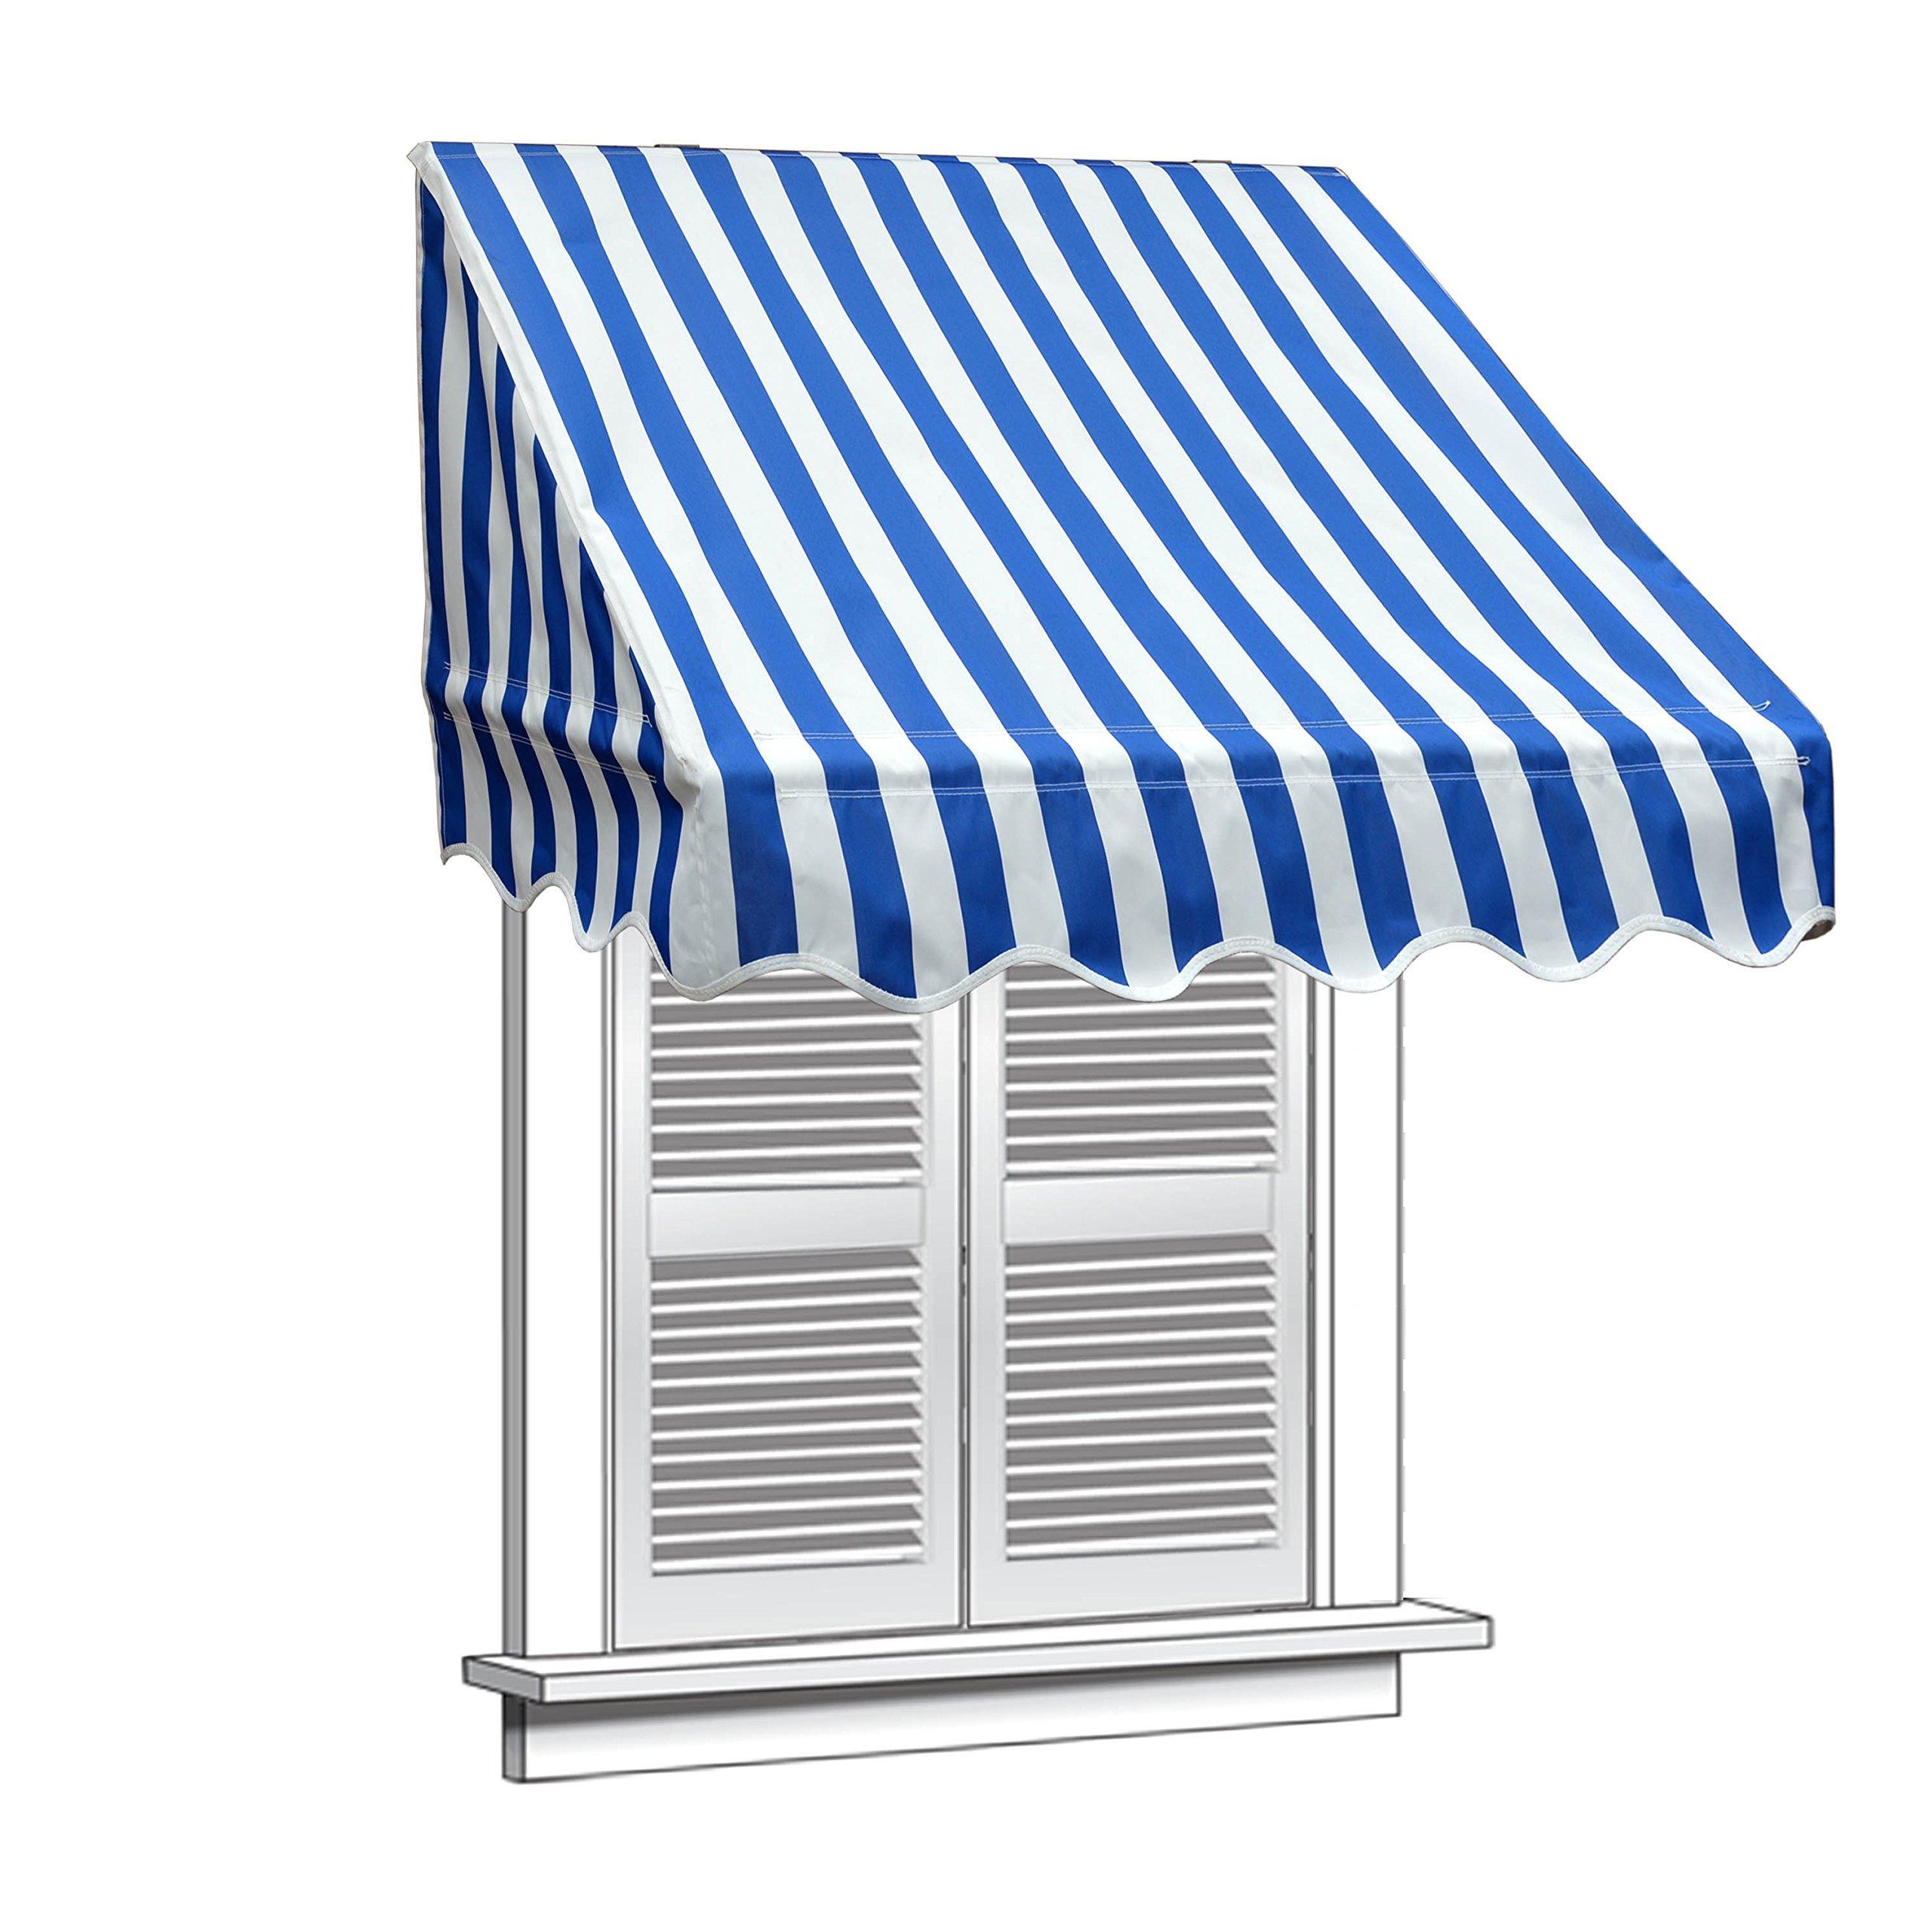 ALEKO 6x2 Feet Blue/White Stripe Window Awning Door Canopy 6-Foot Decorator Awning by ALEKO